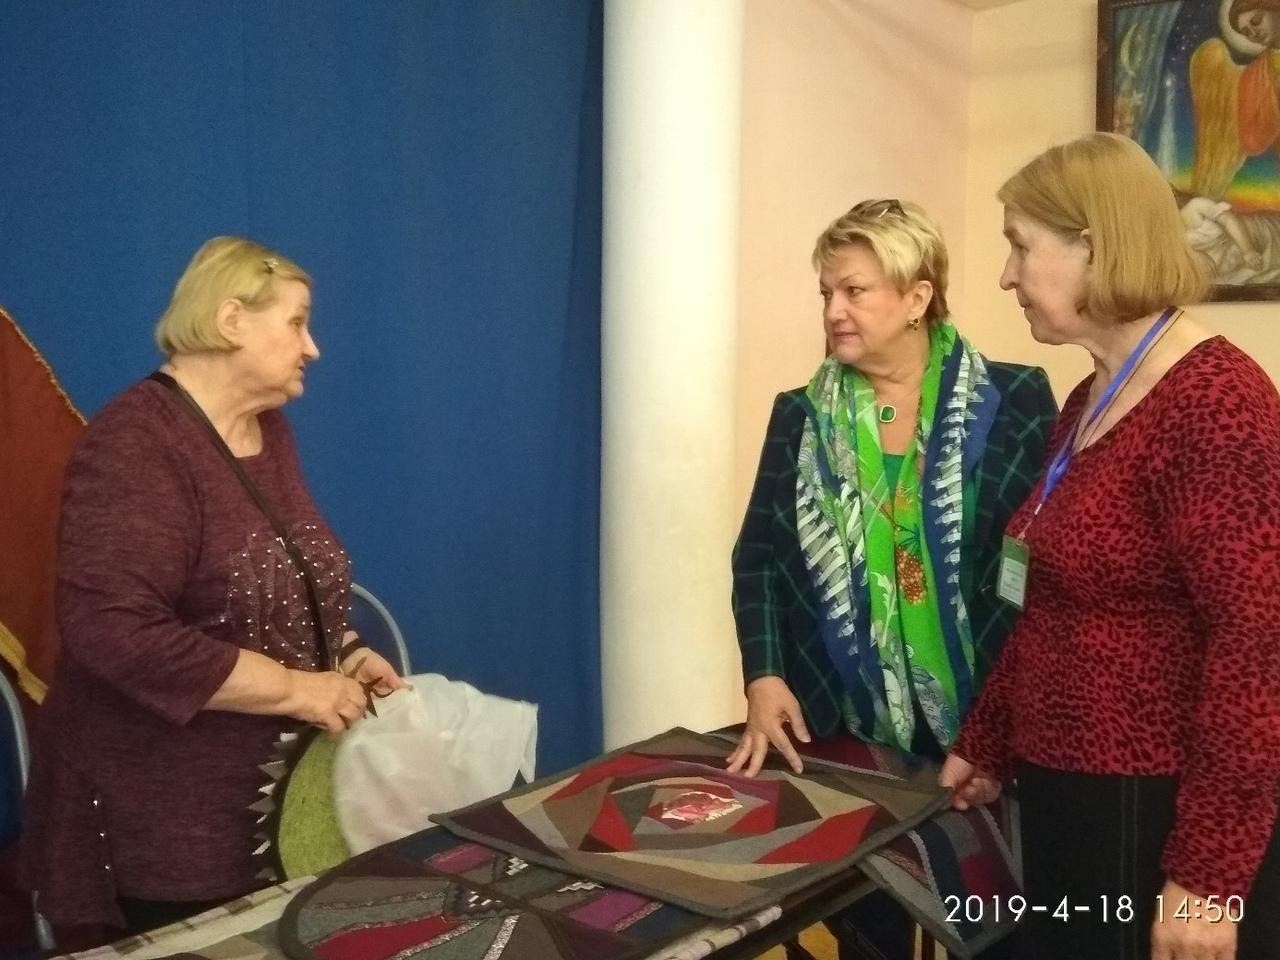 Заверяева Г.Г. (слева), Назарова И.А. и Лубенко Н.А. (справа)